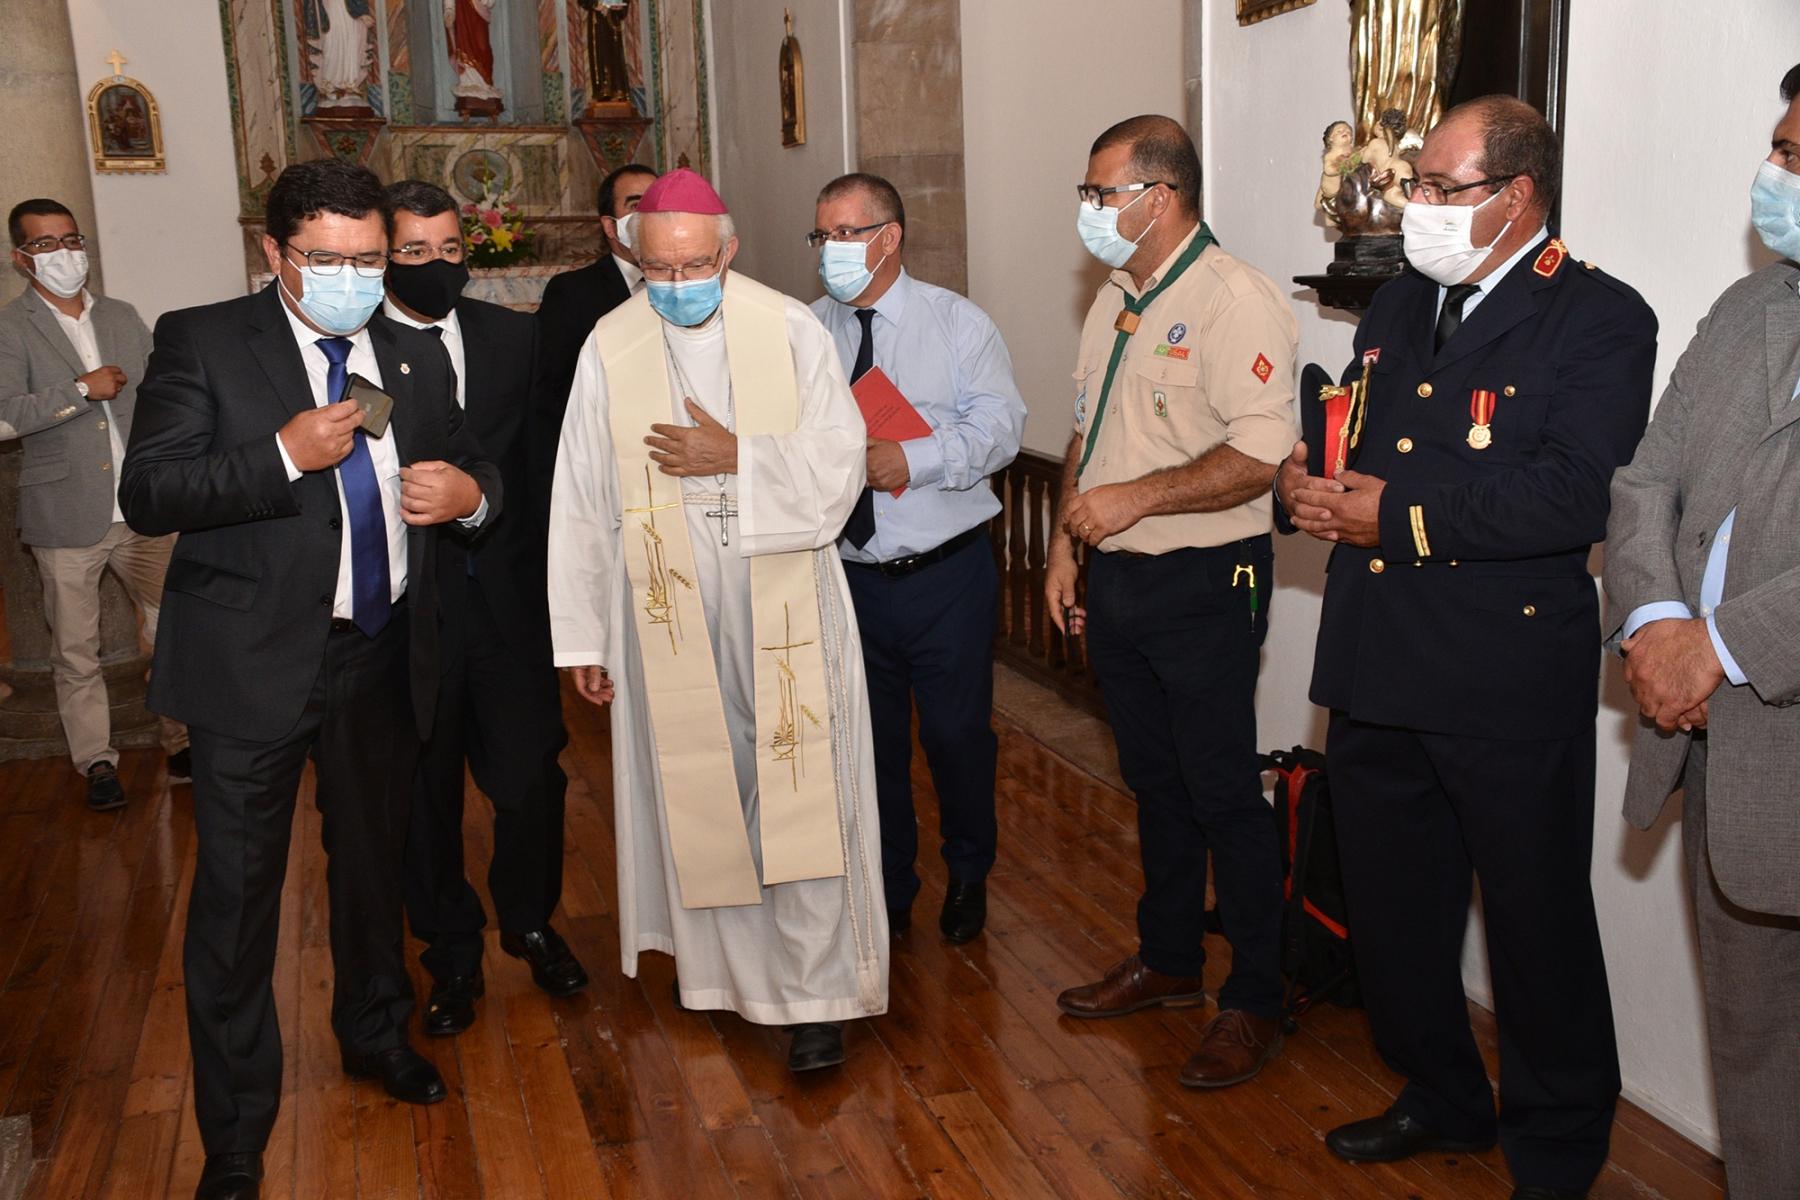 Inauguracao_bencao_obras_restauro_igreja_alcoutim-34